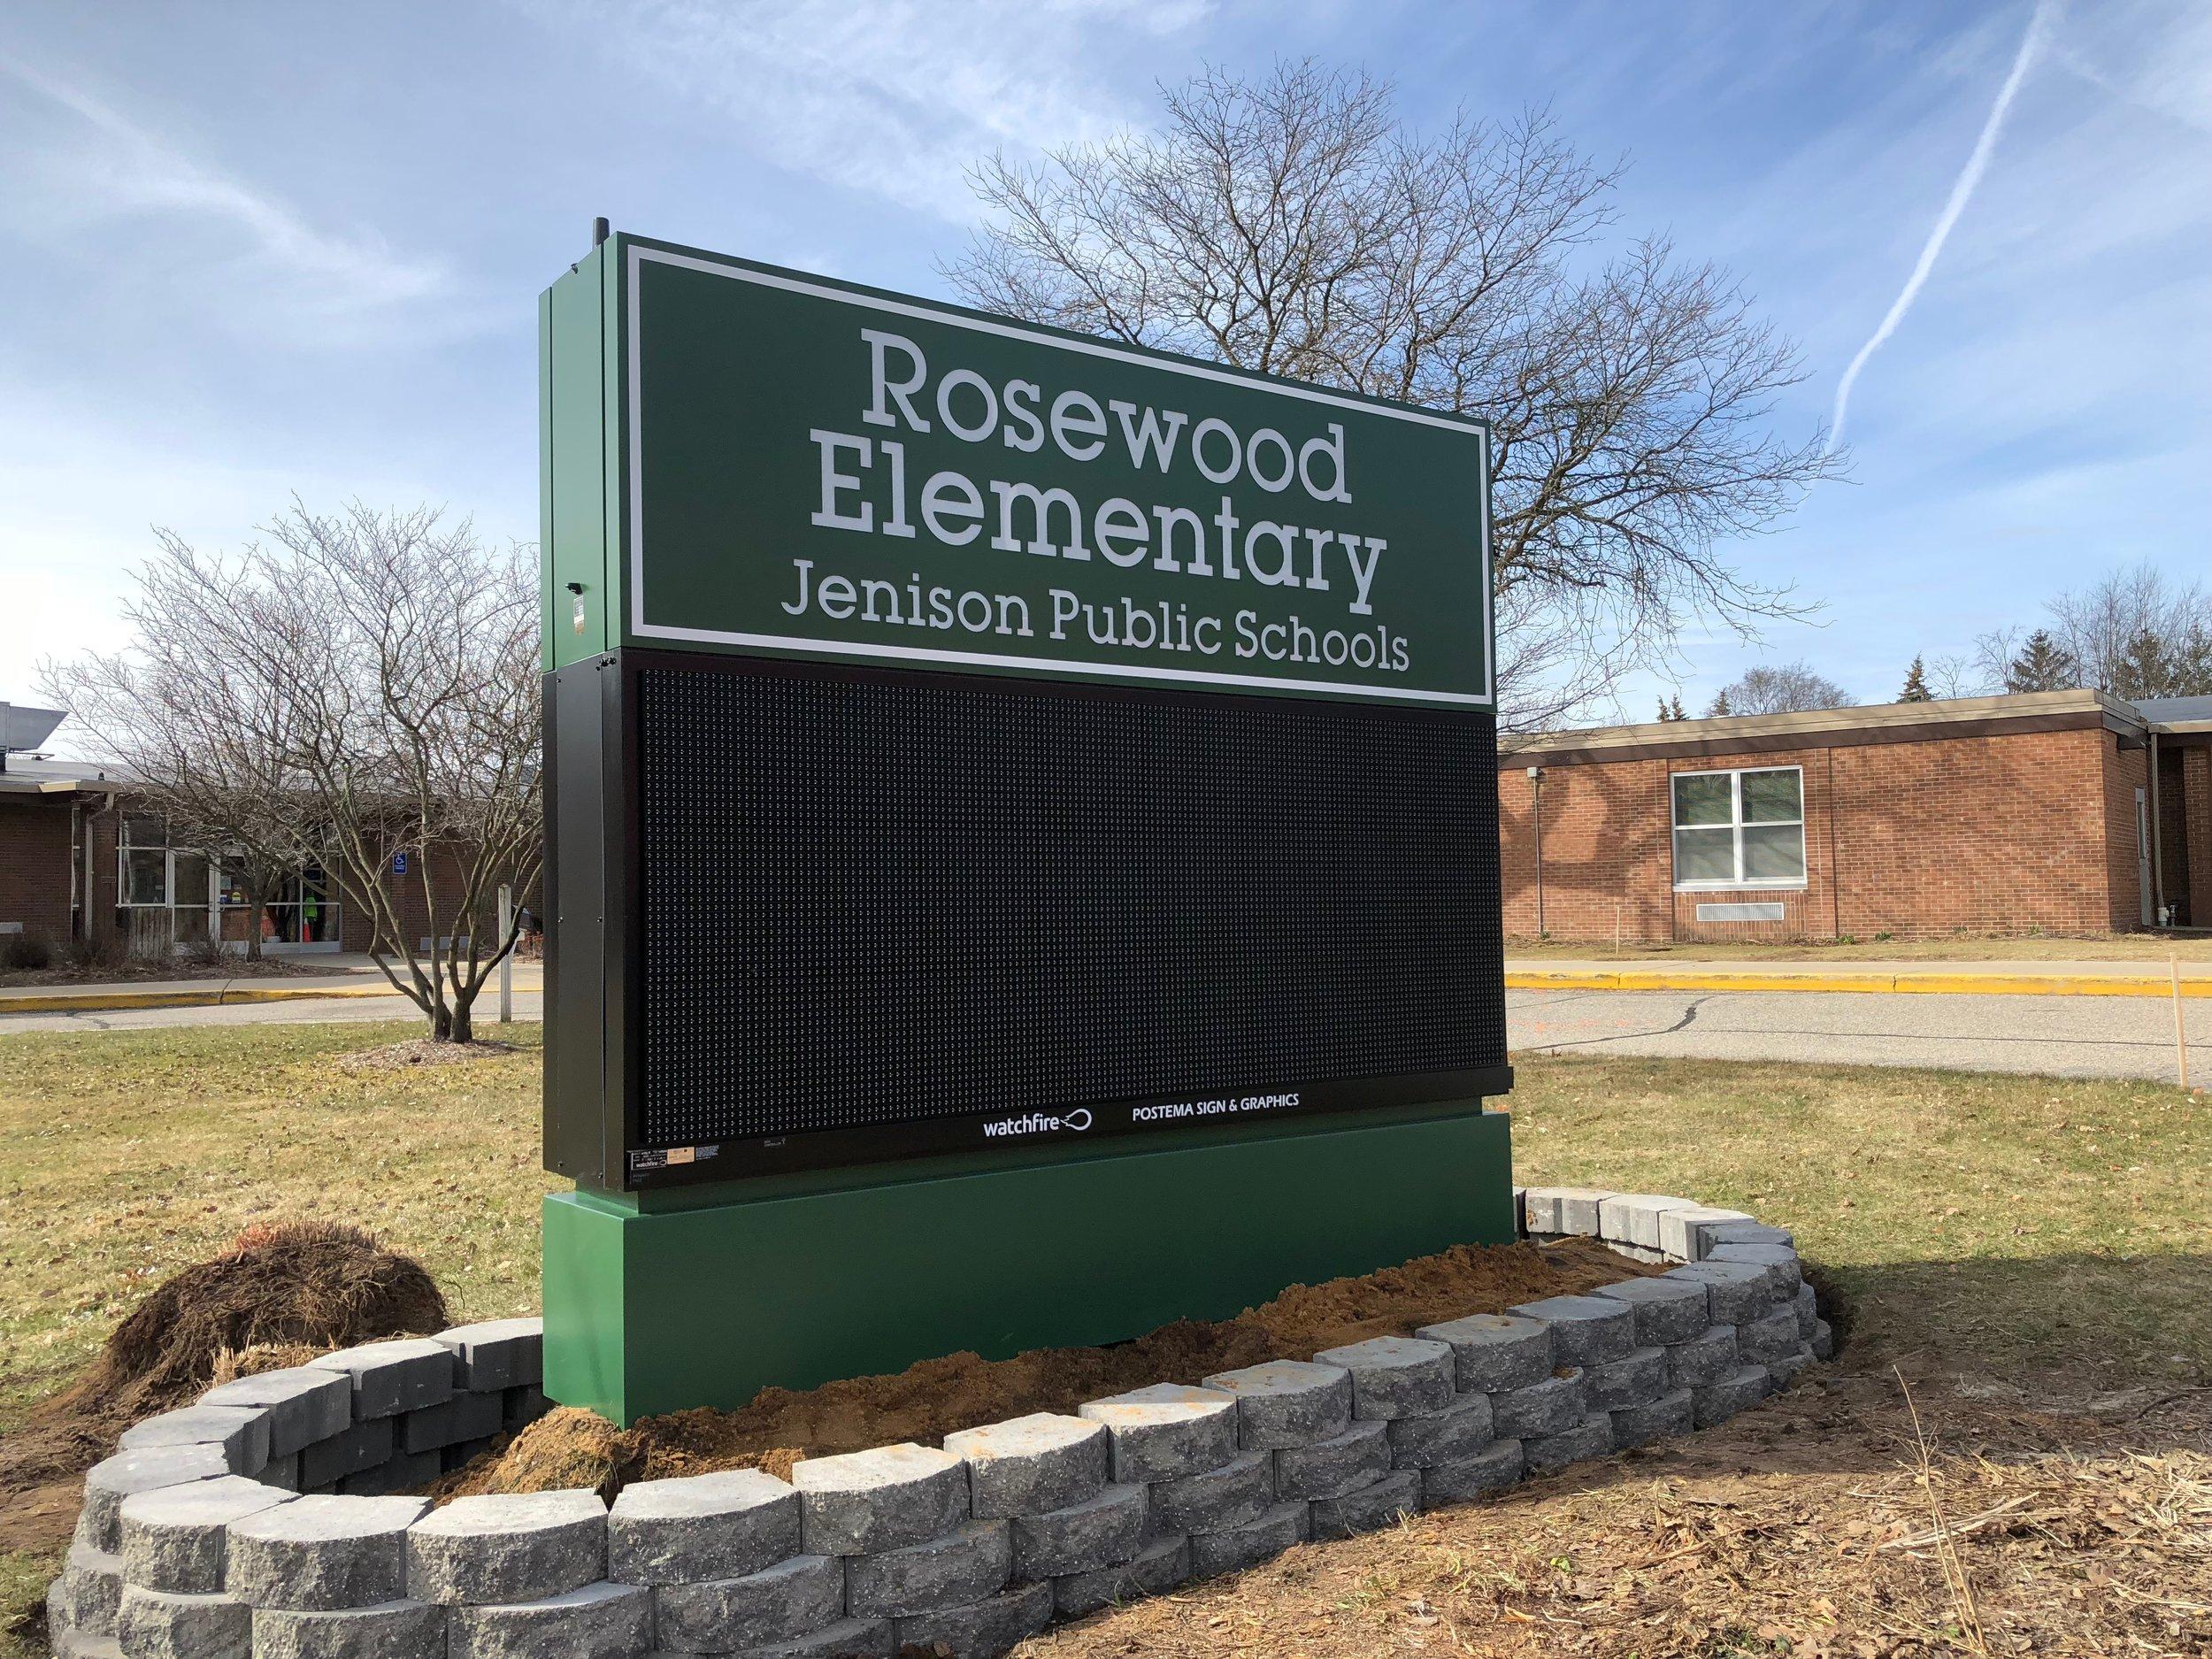 Rosewood Elementary - Jenison Public Schools. 3.30.18 JPG